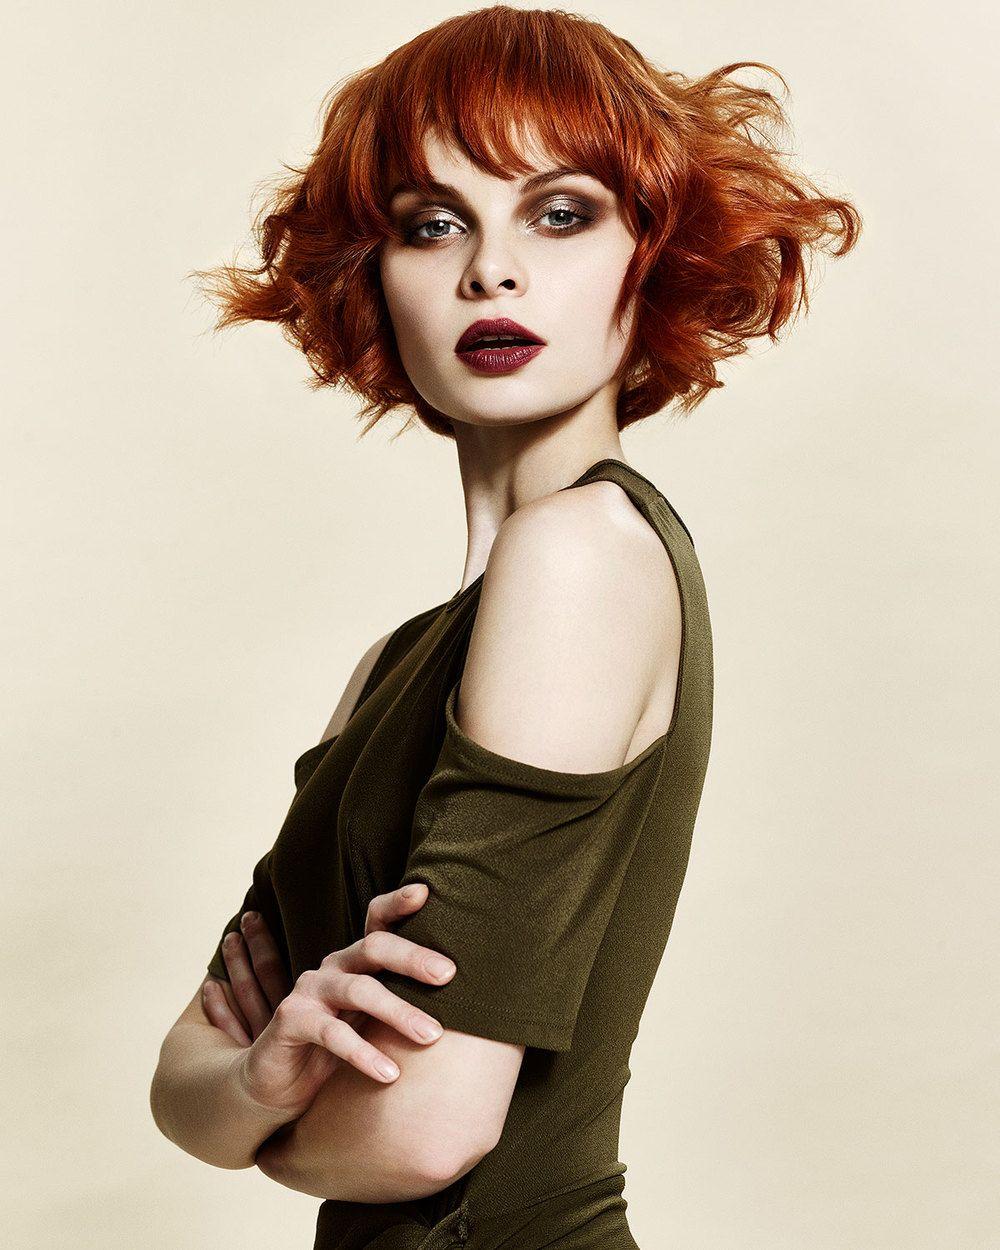 Hair Beauty, Photography Awards, Hairdresser